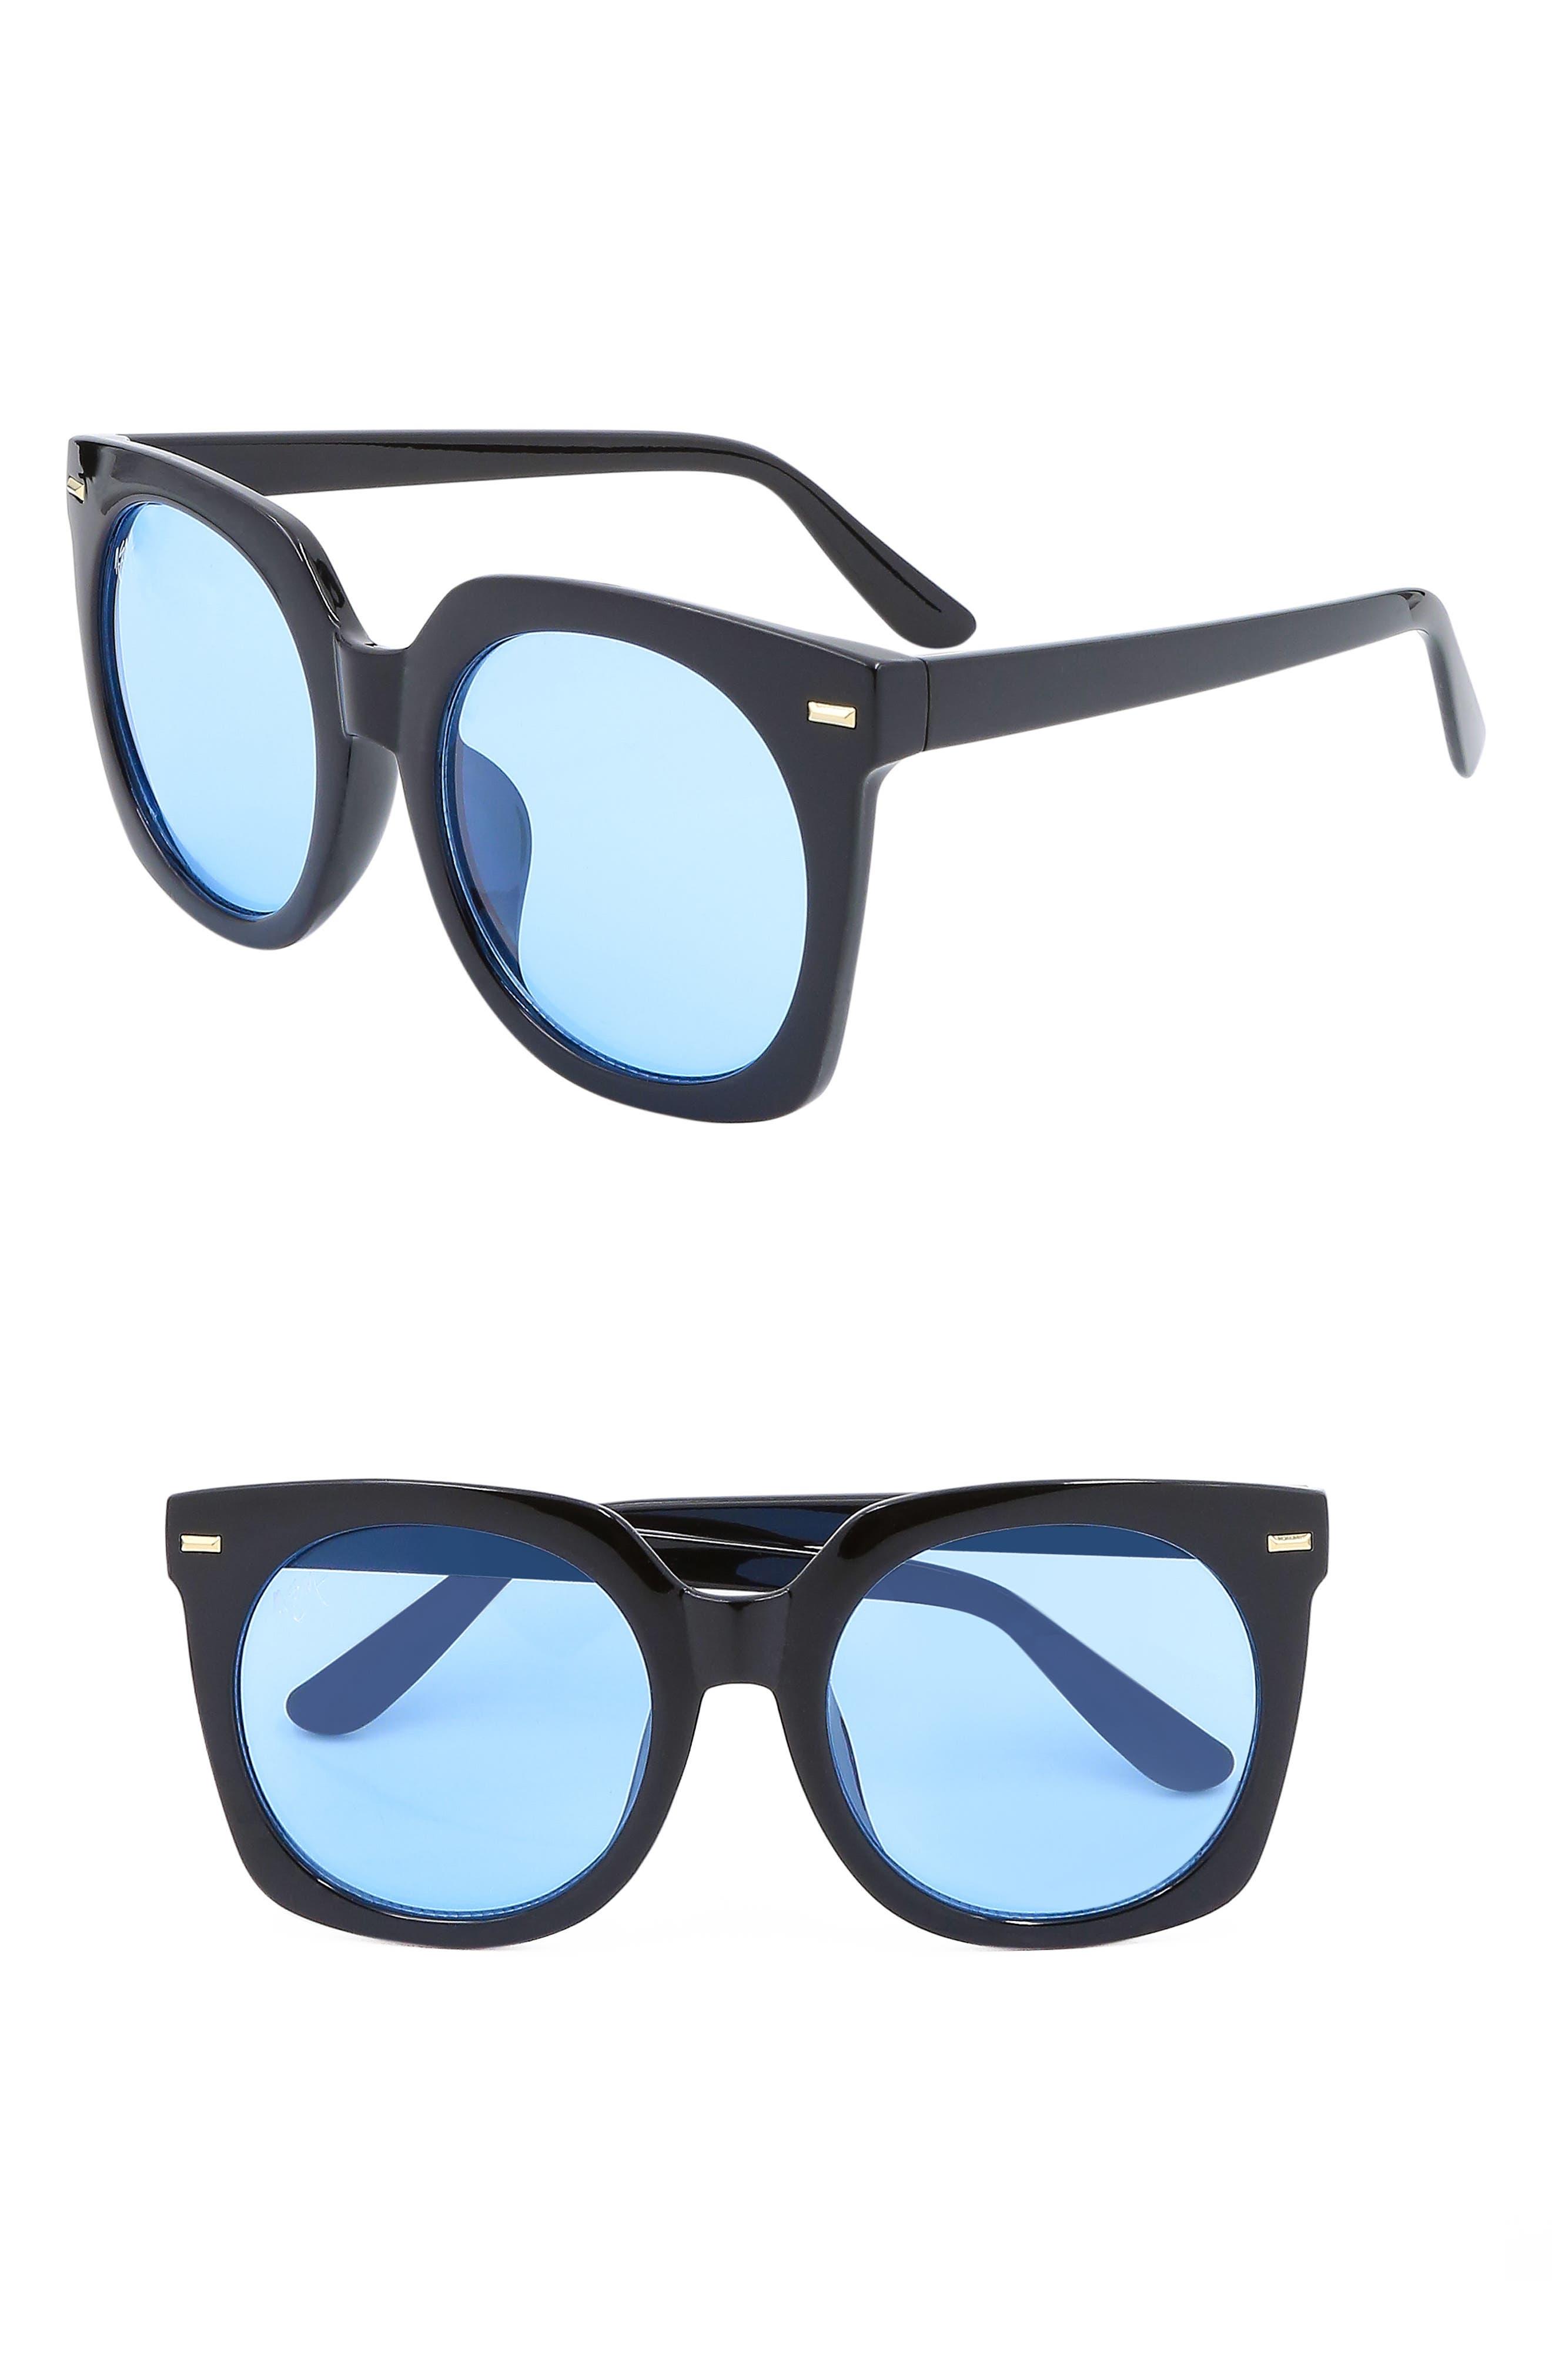 Nem Melrose 55Mm Square Sunglasses - Black W Sky Blue Tint Lens